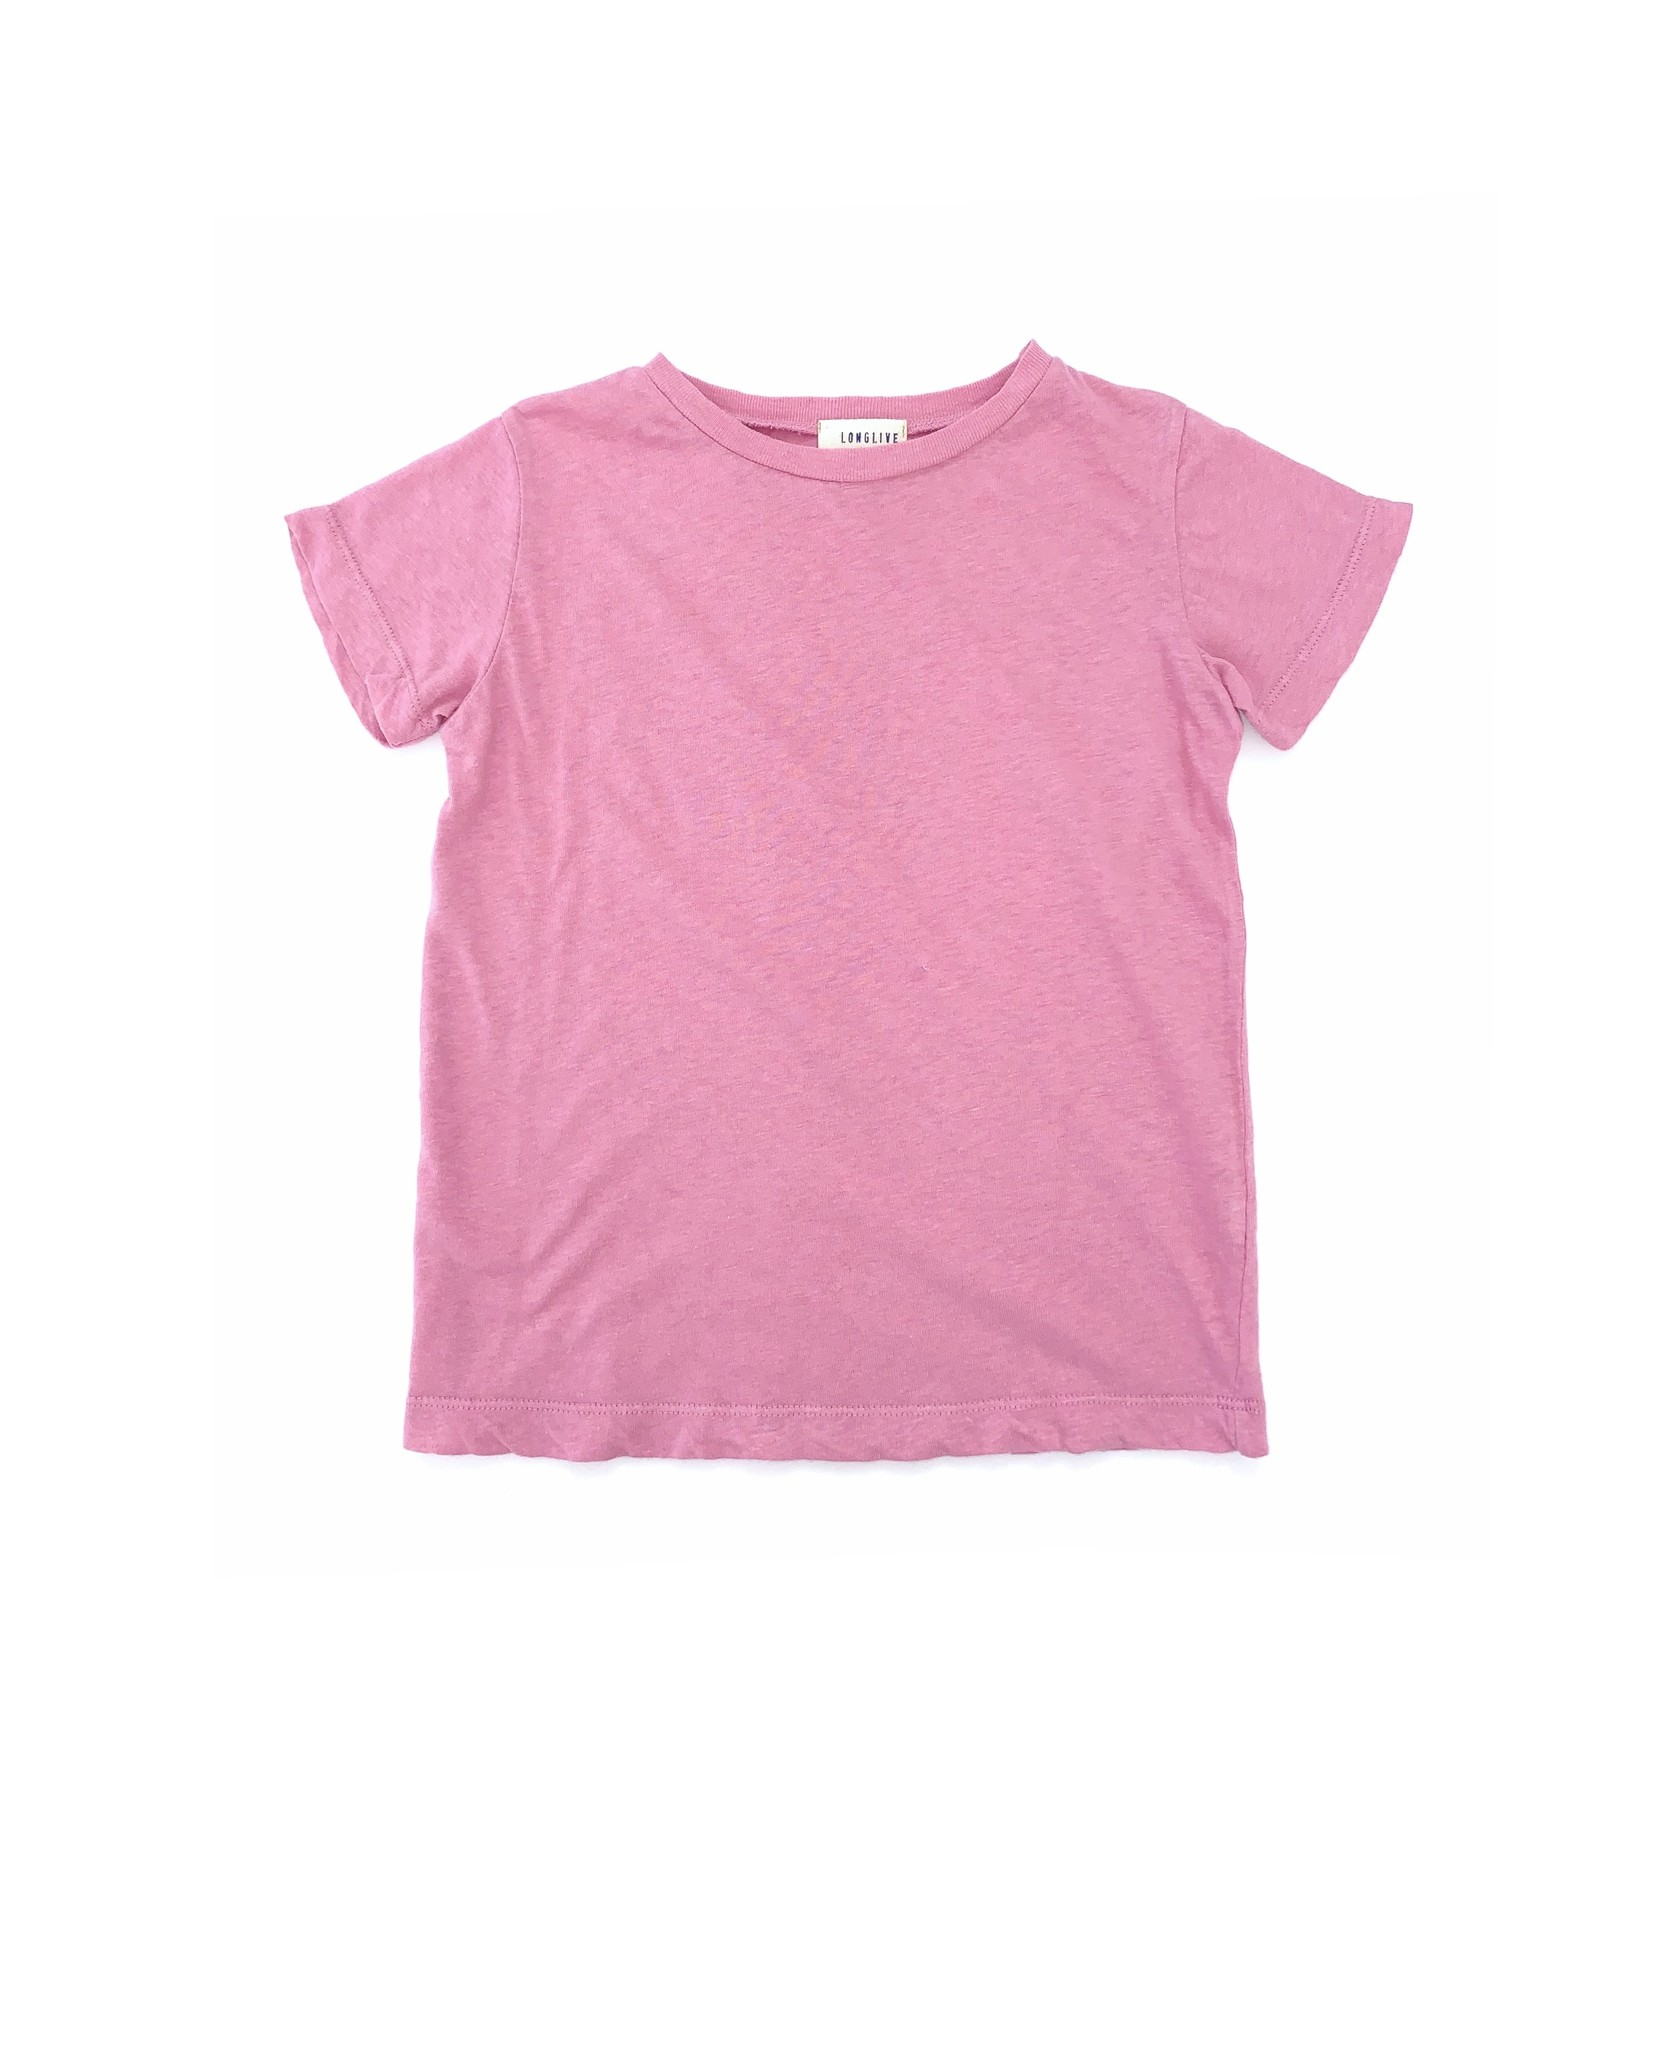 Tee - Pink-1